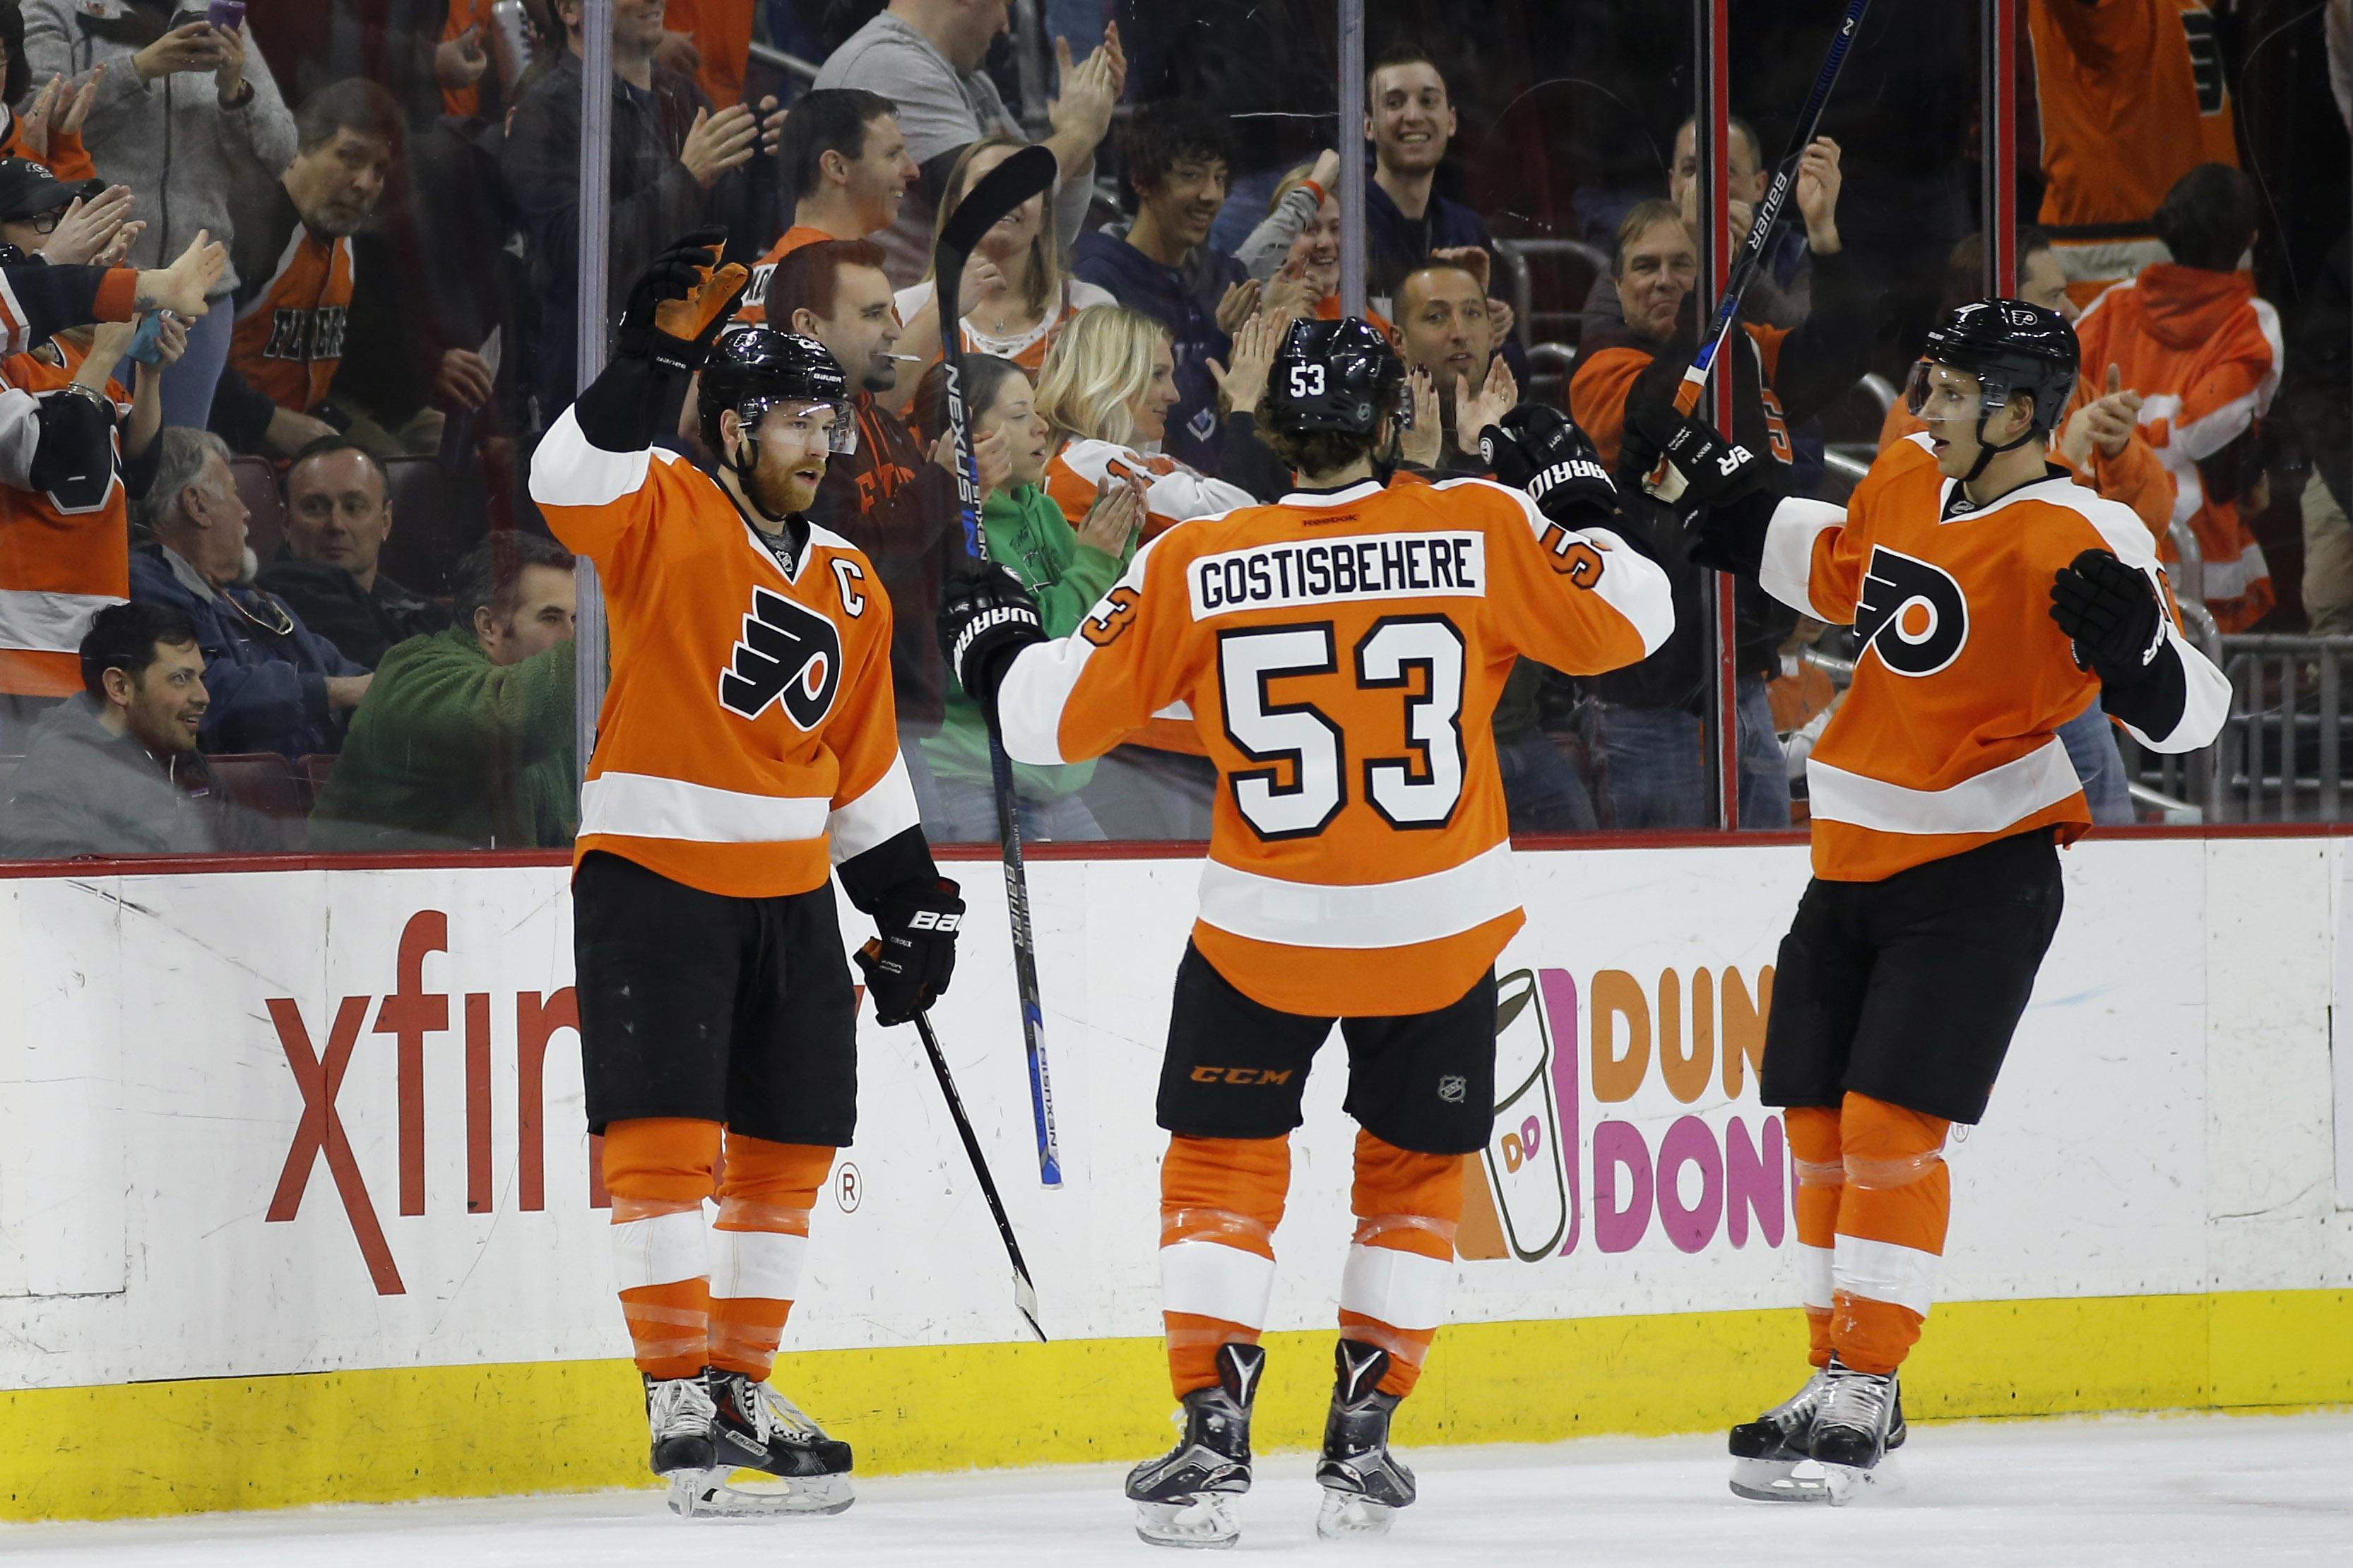 Philadelphia Flyers' Claude Giroux, left, Shayne Gostisbehere and Brayden Schenn celebrate after Giroux's goal during the first period of an NHL hockey game against the Arizona Coyotes, Saturday, Feb. 27, 2016, in Philadelphia. Philadelphia won 4-2. (AP P